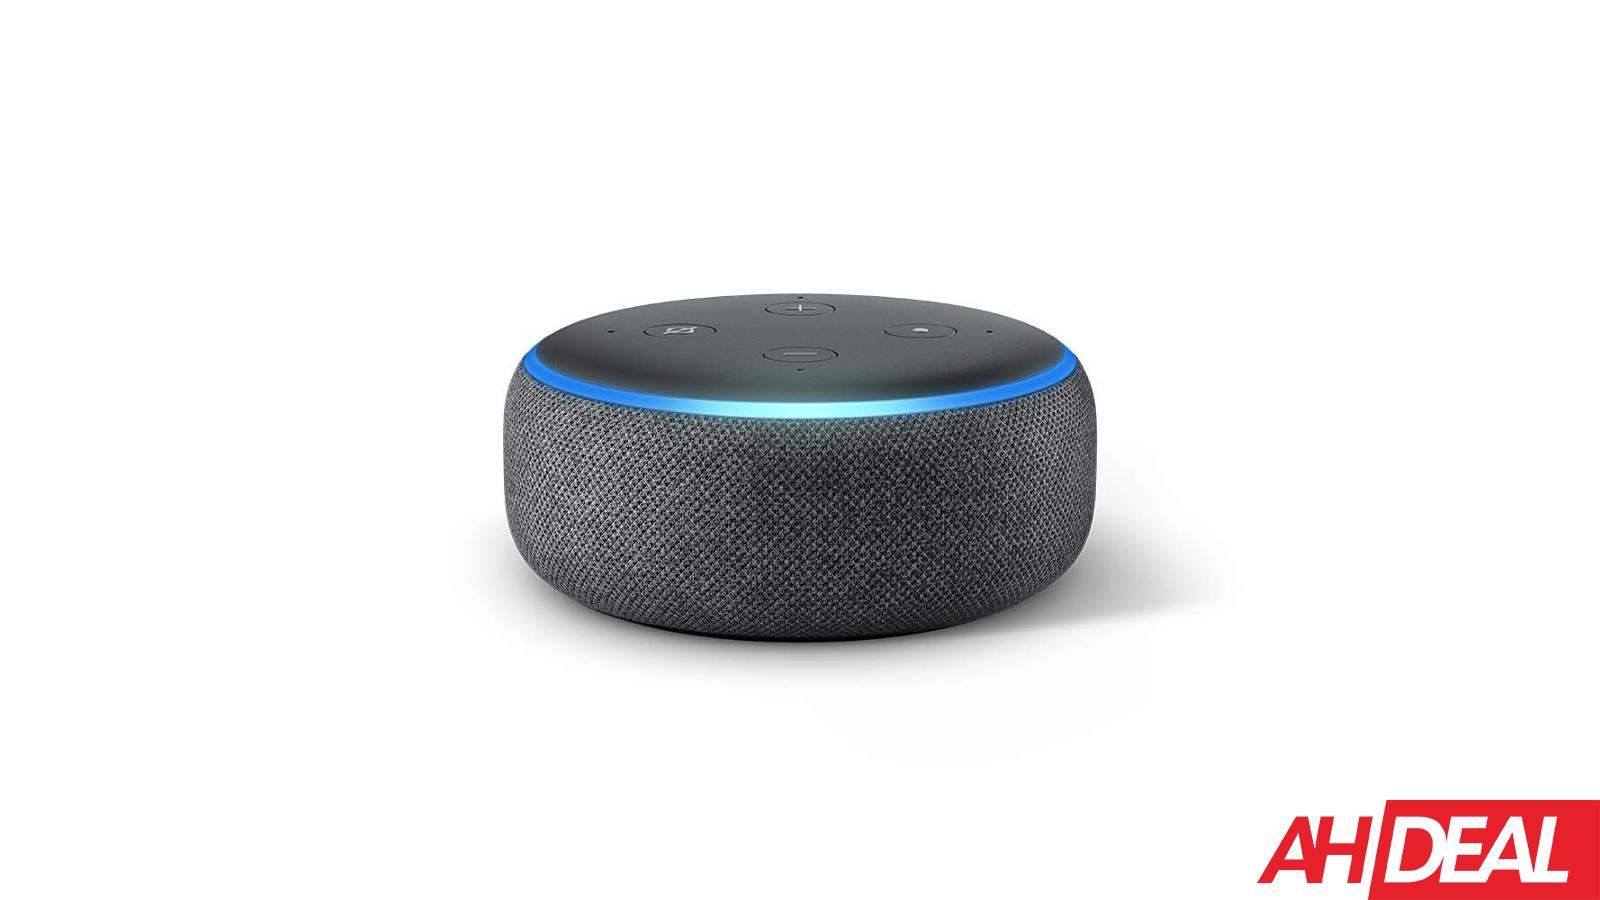 Buy 2 Amazon Echo Dot (3rd Gen) For $60 – Amazon Deals